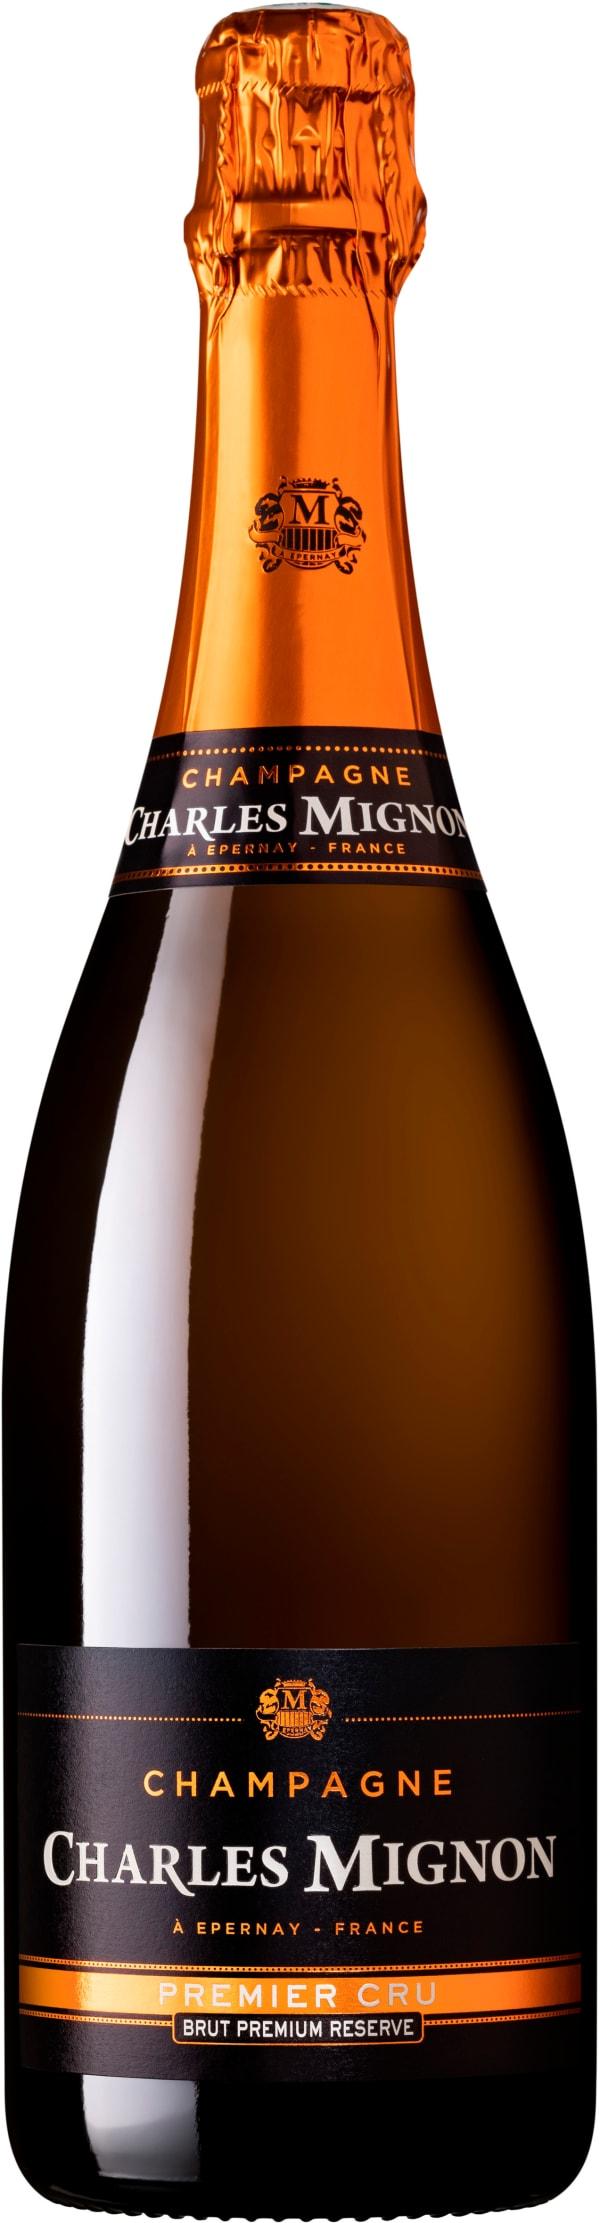 Charles Mignon Premium Reservé 1 er Cru Champagne Brut